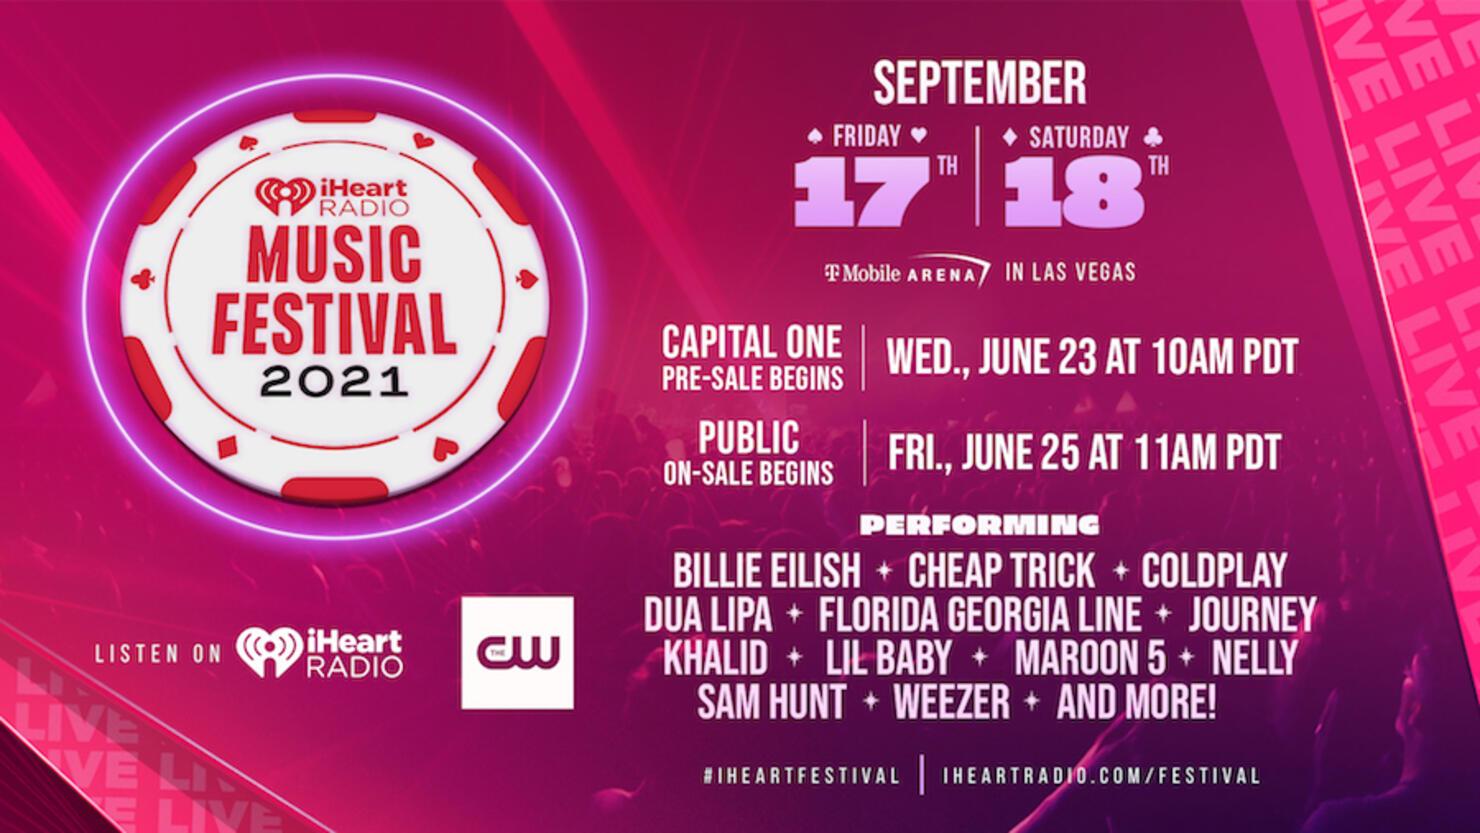 iheart music festival lineup 2021